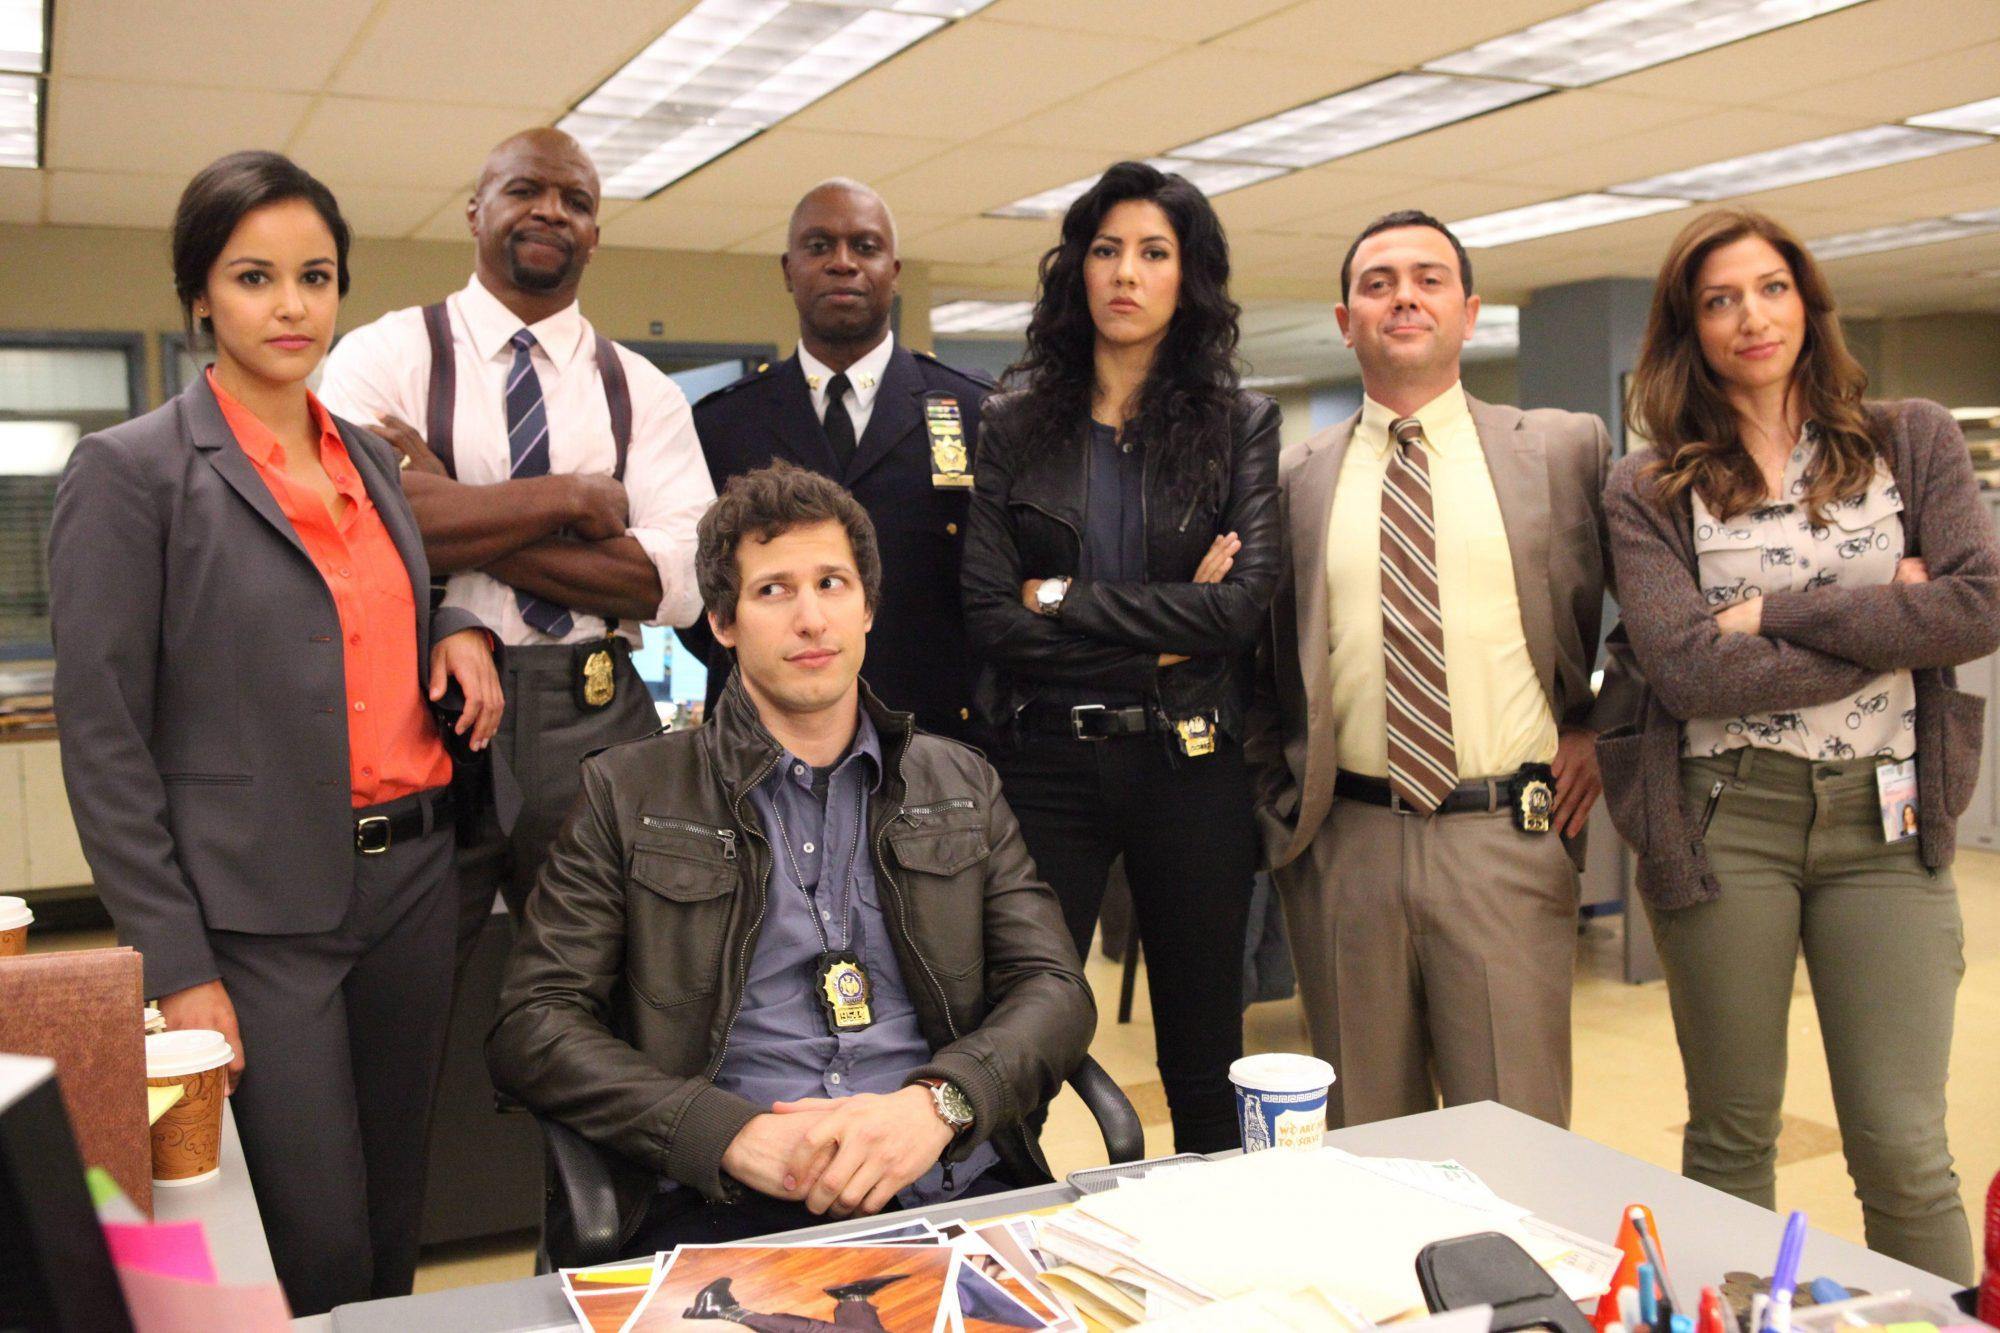 Brooklyn-Nine-Nine-02-cast.jpg